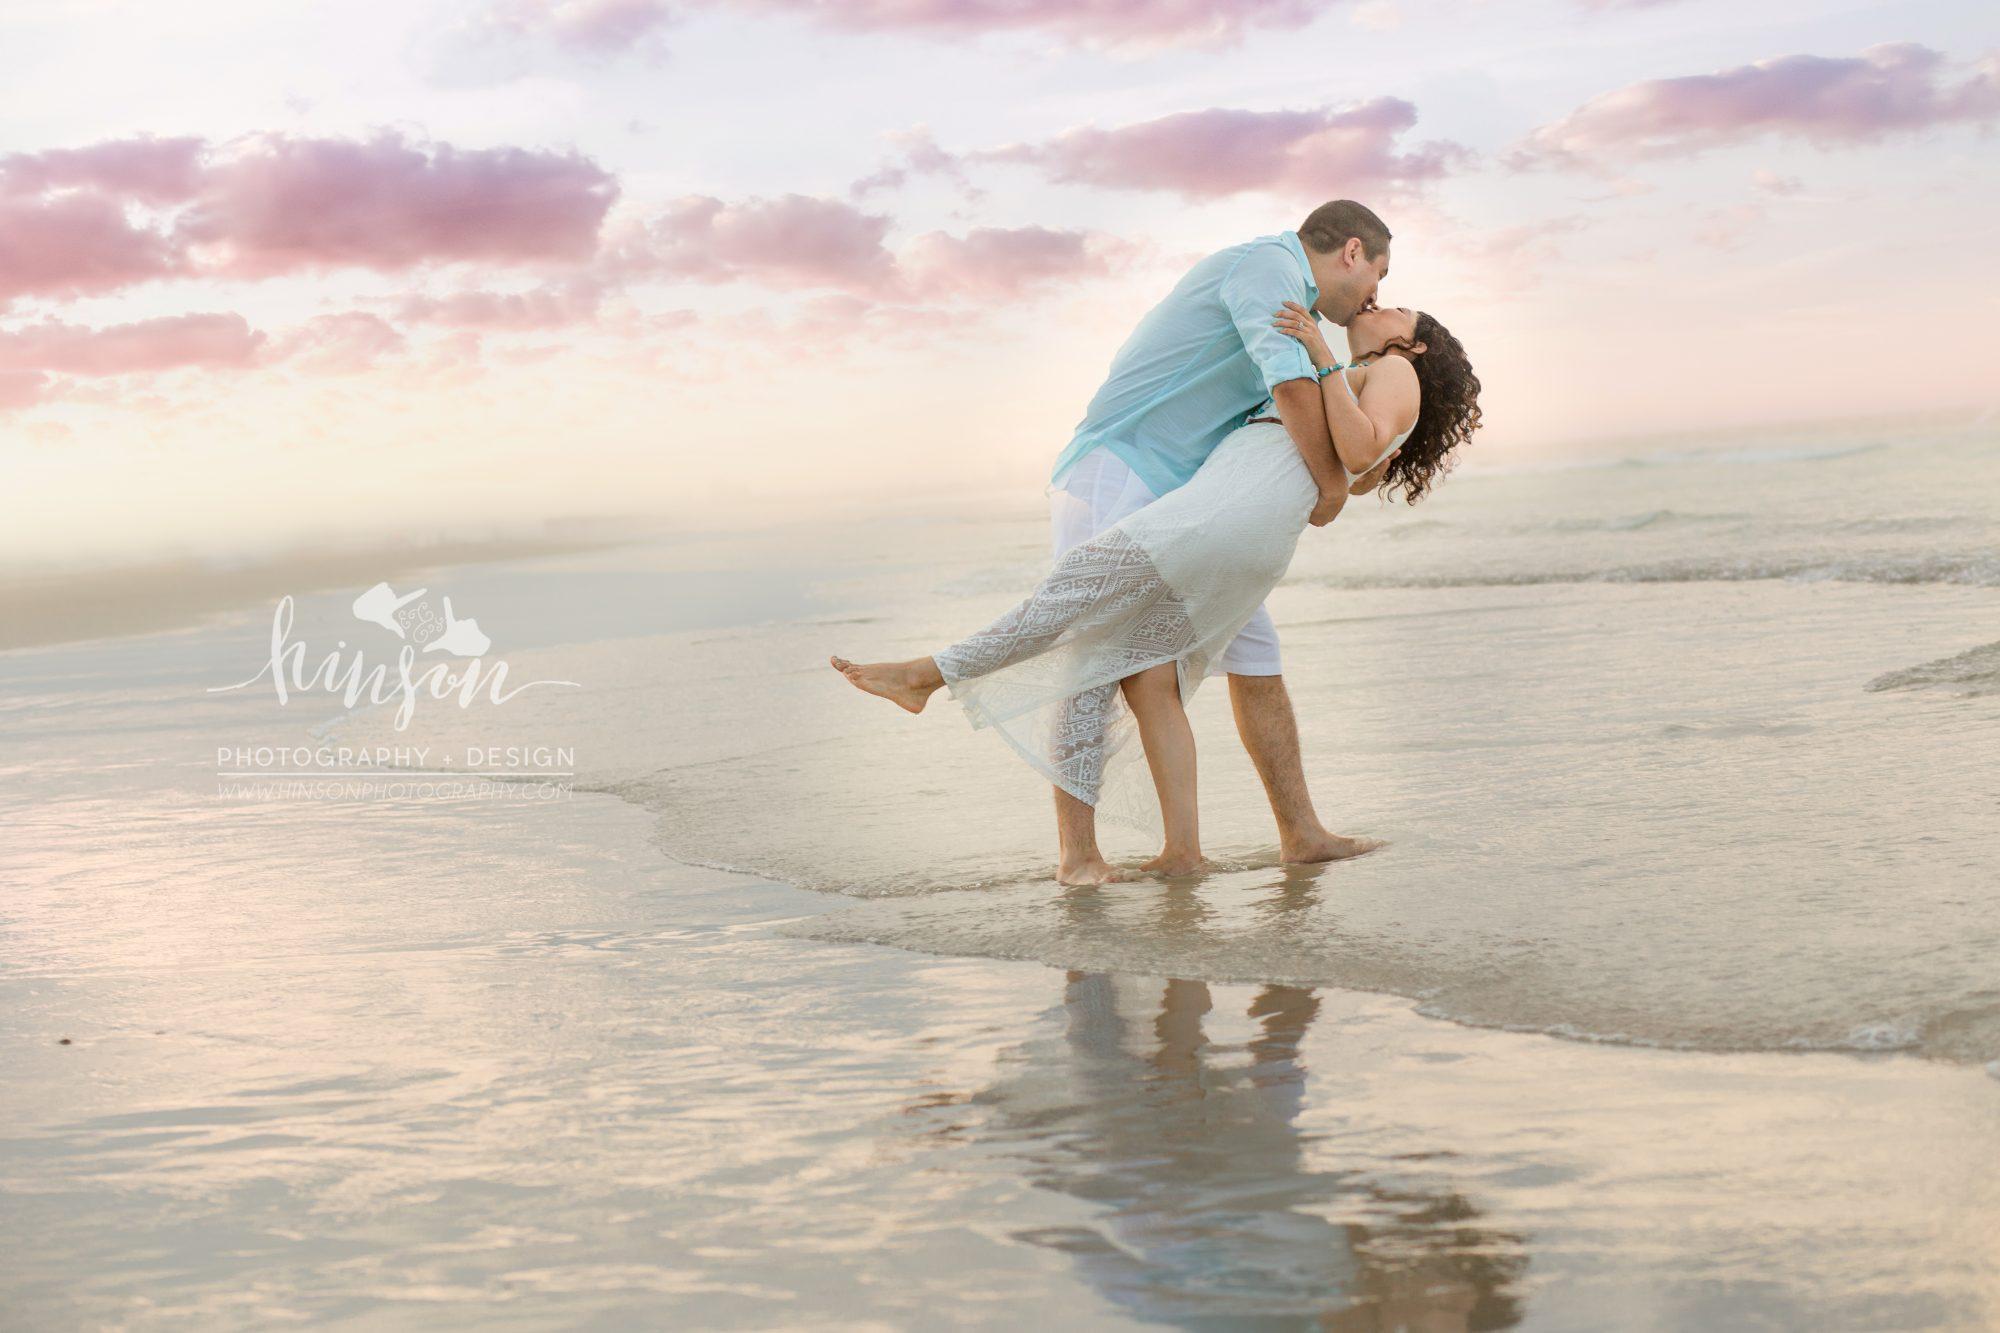 daytona beach photography, orlando photographer, beach portraits, sunset photos, family portraits, central florida photographer